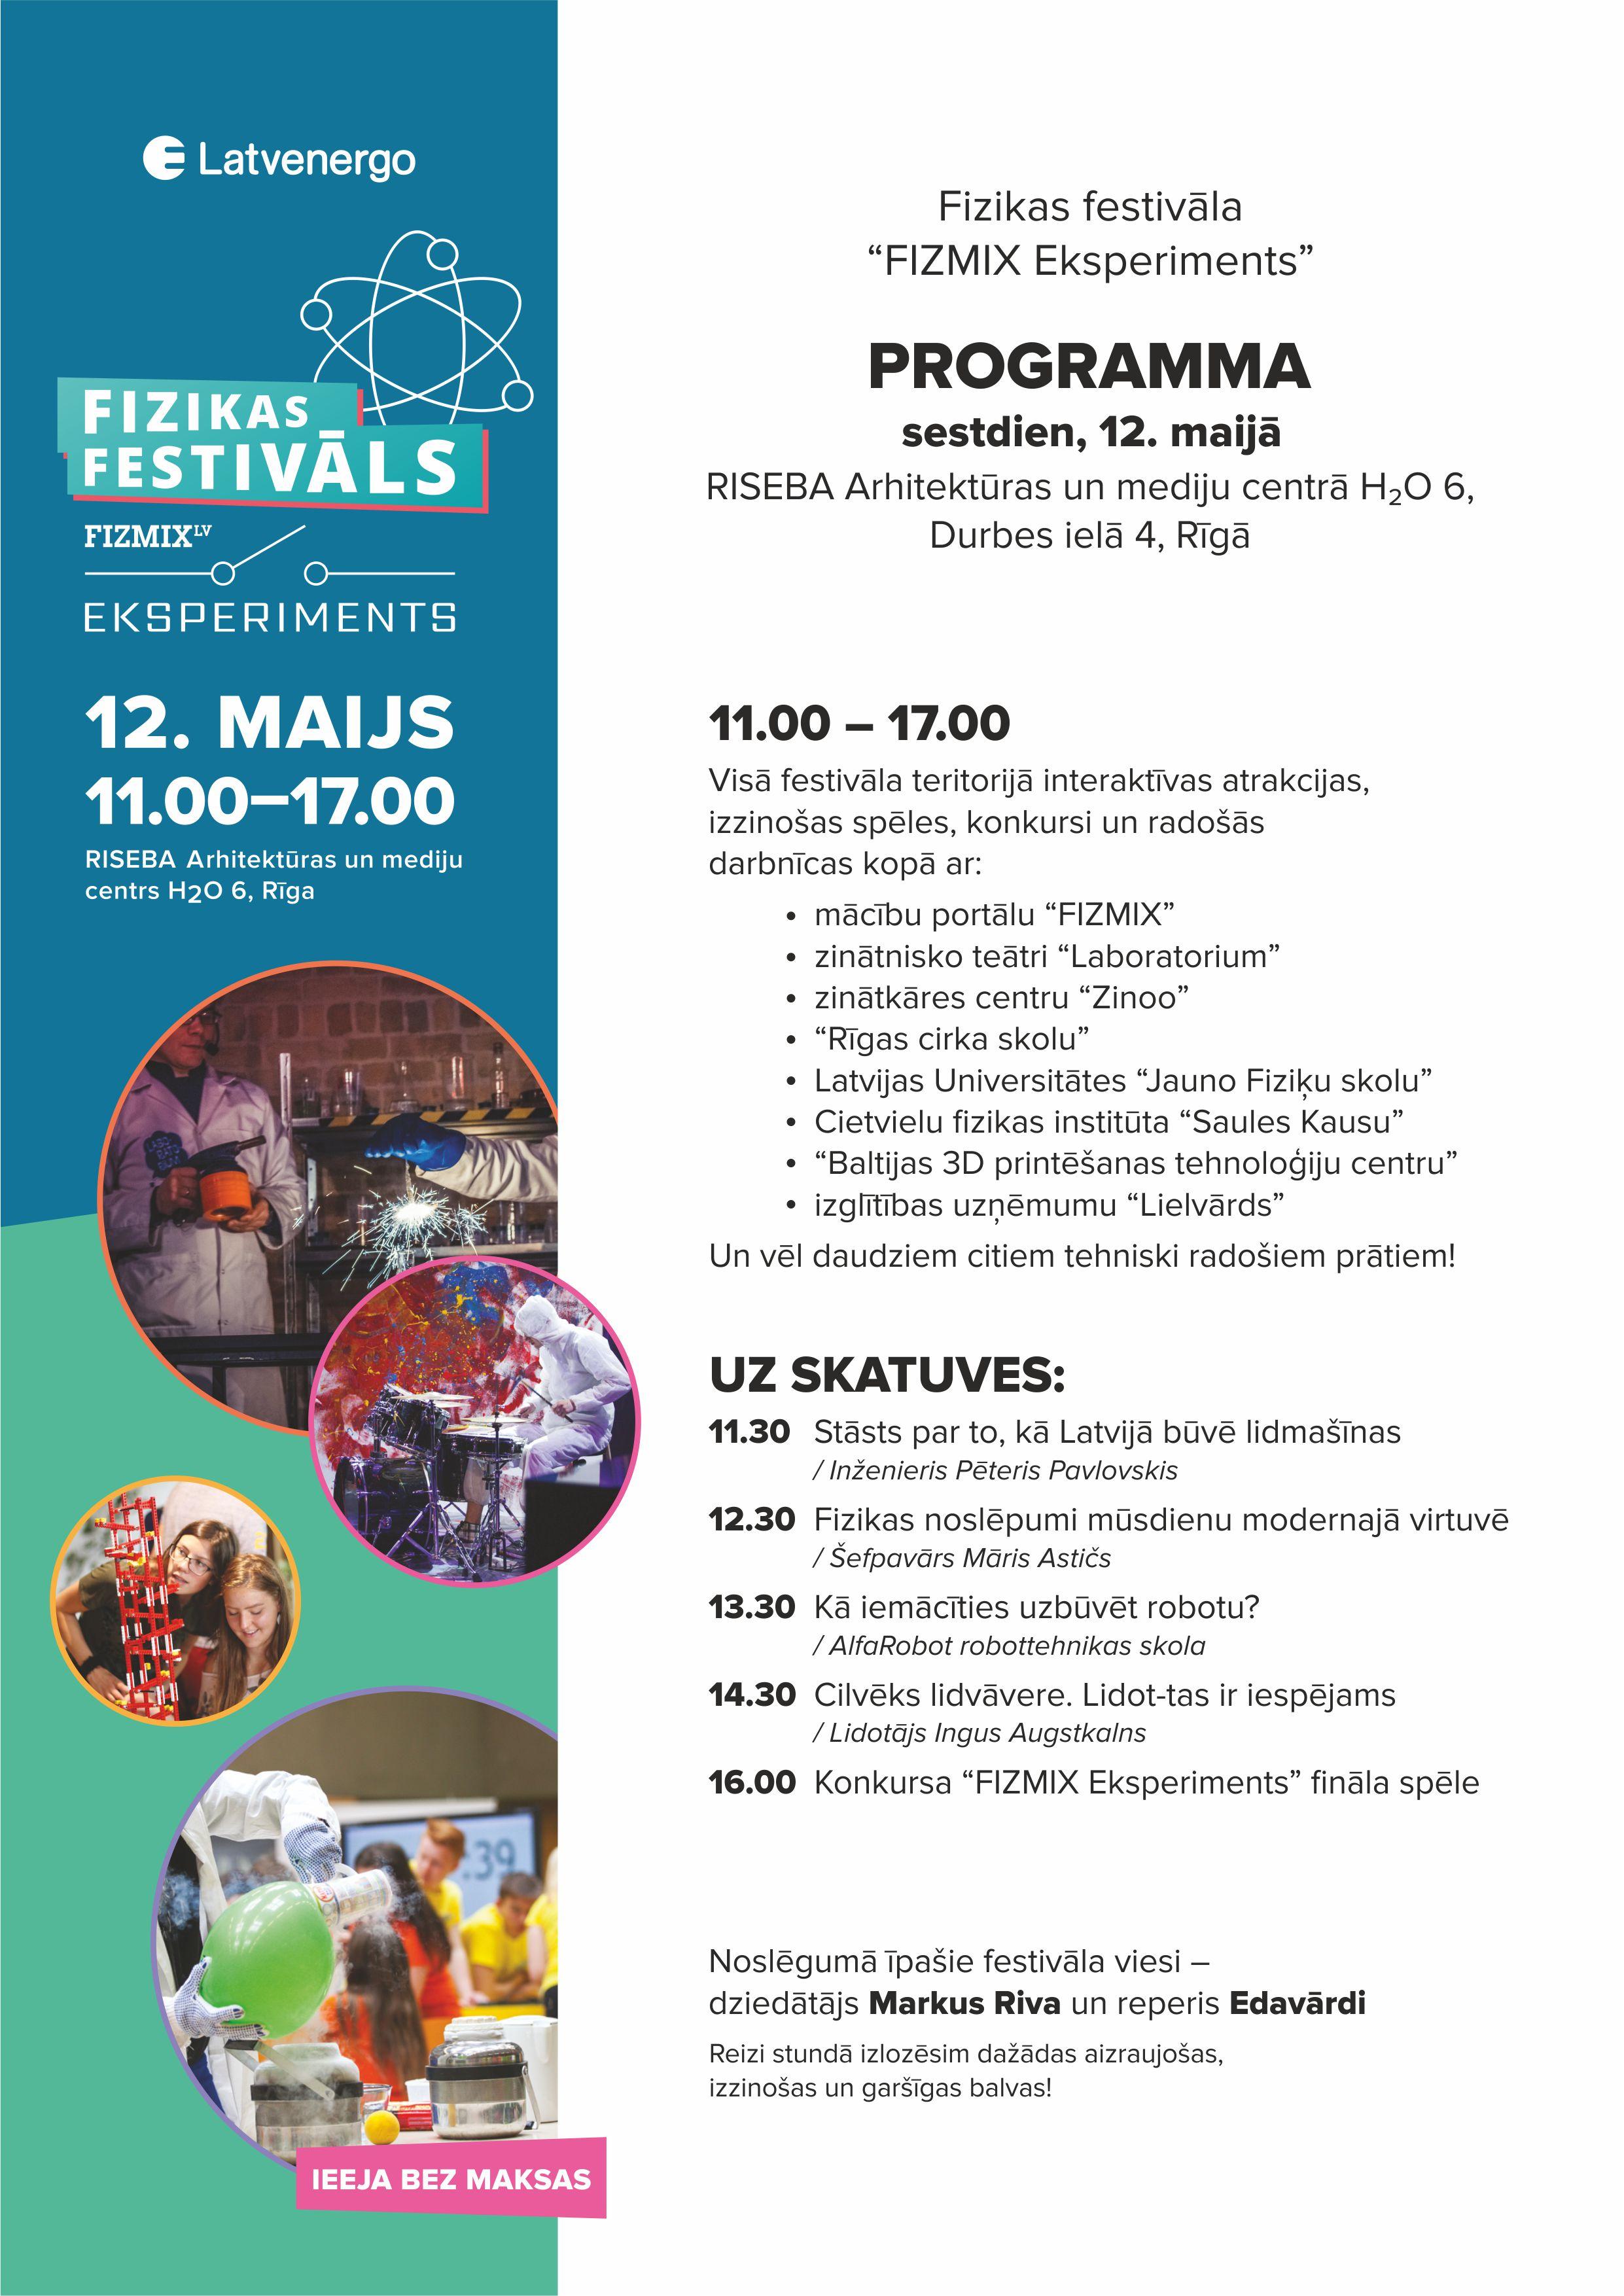 Fizikas festivala programma